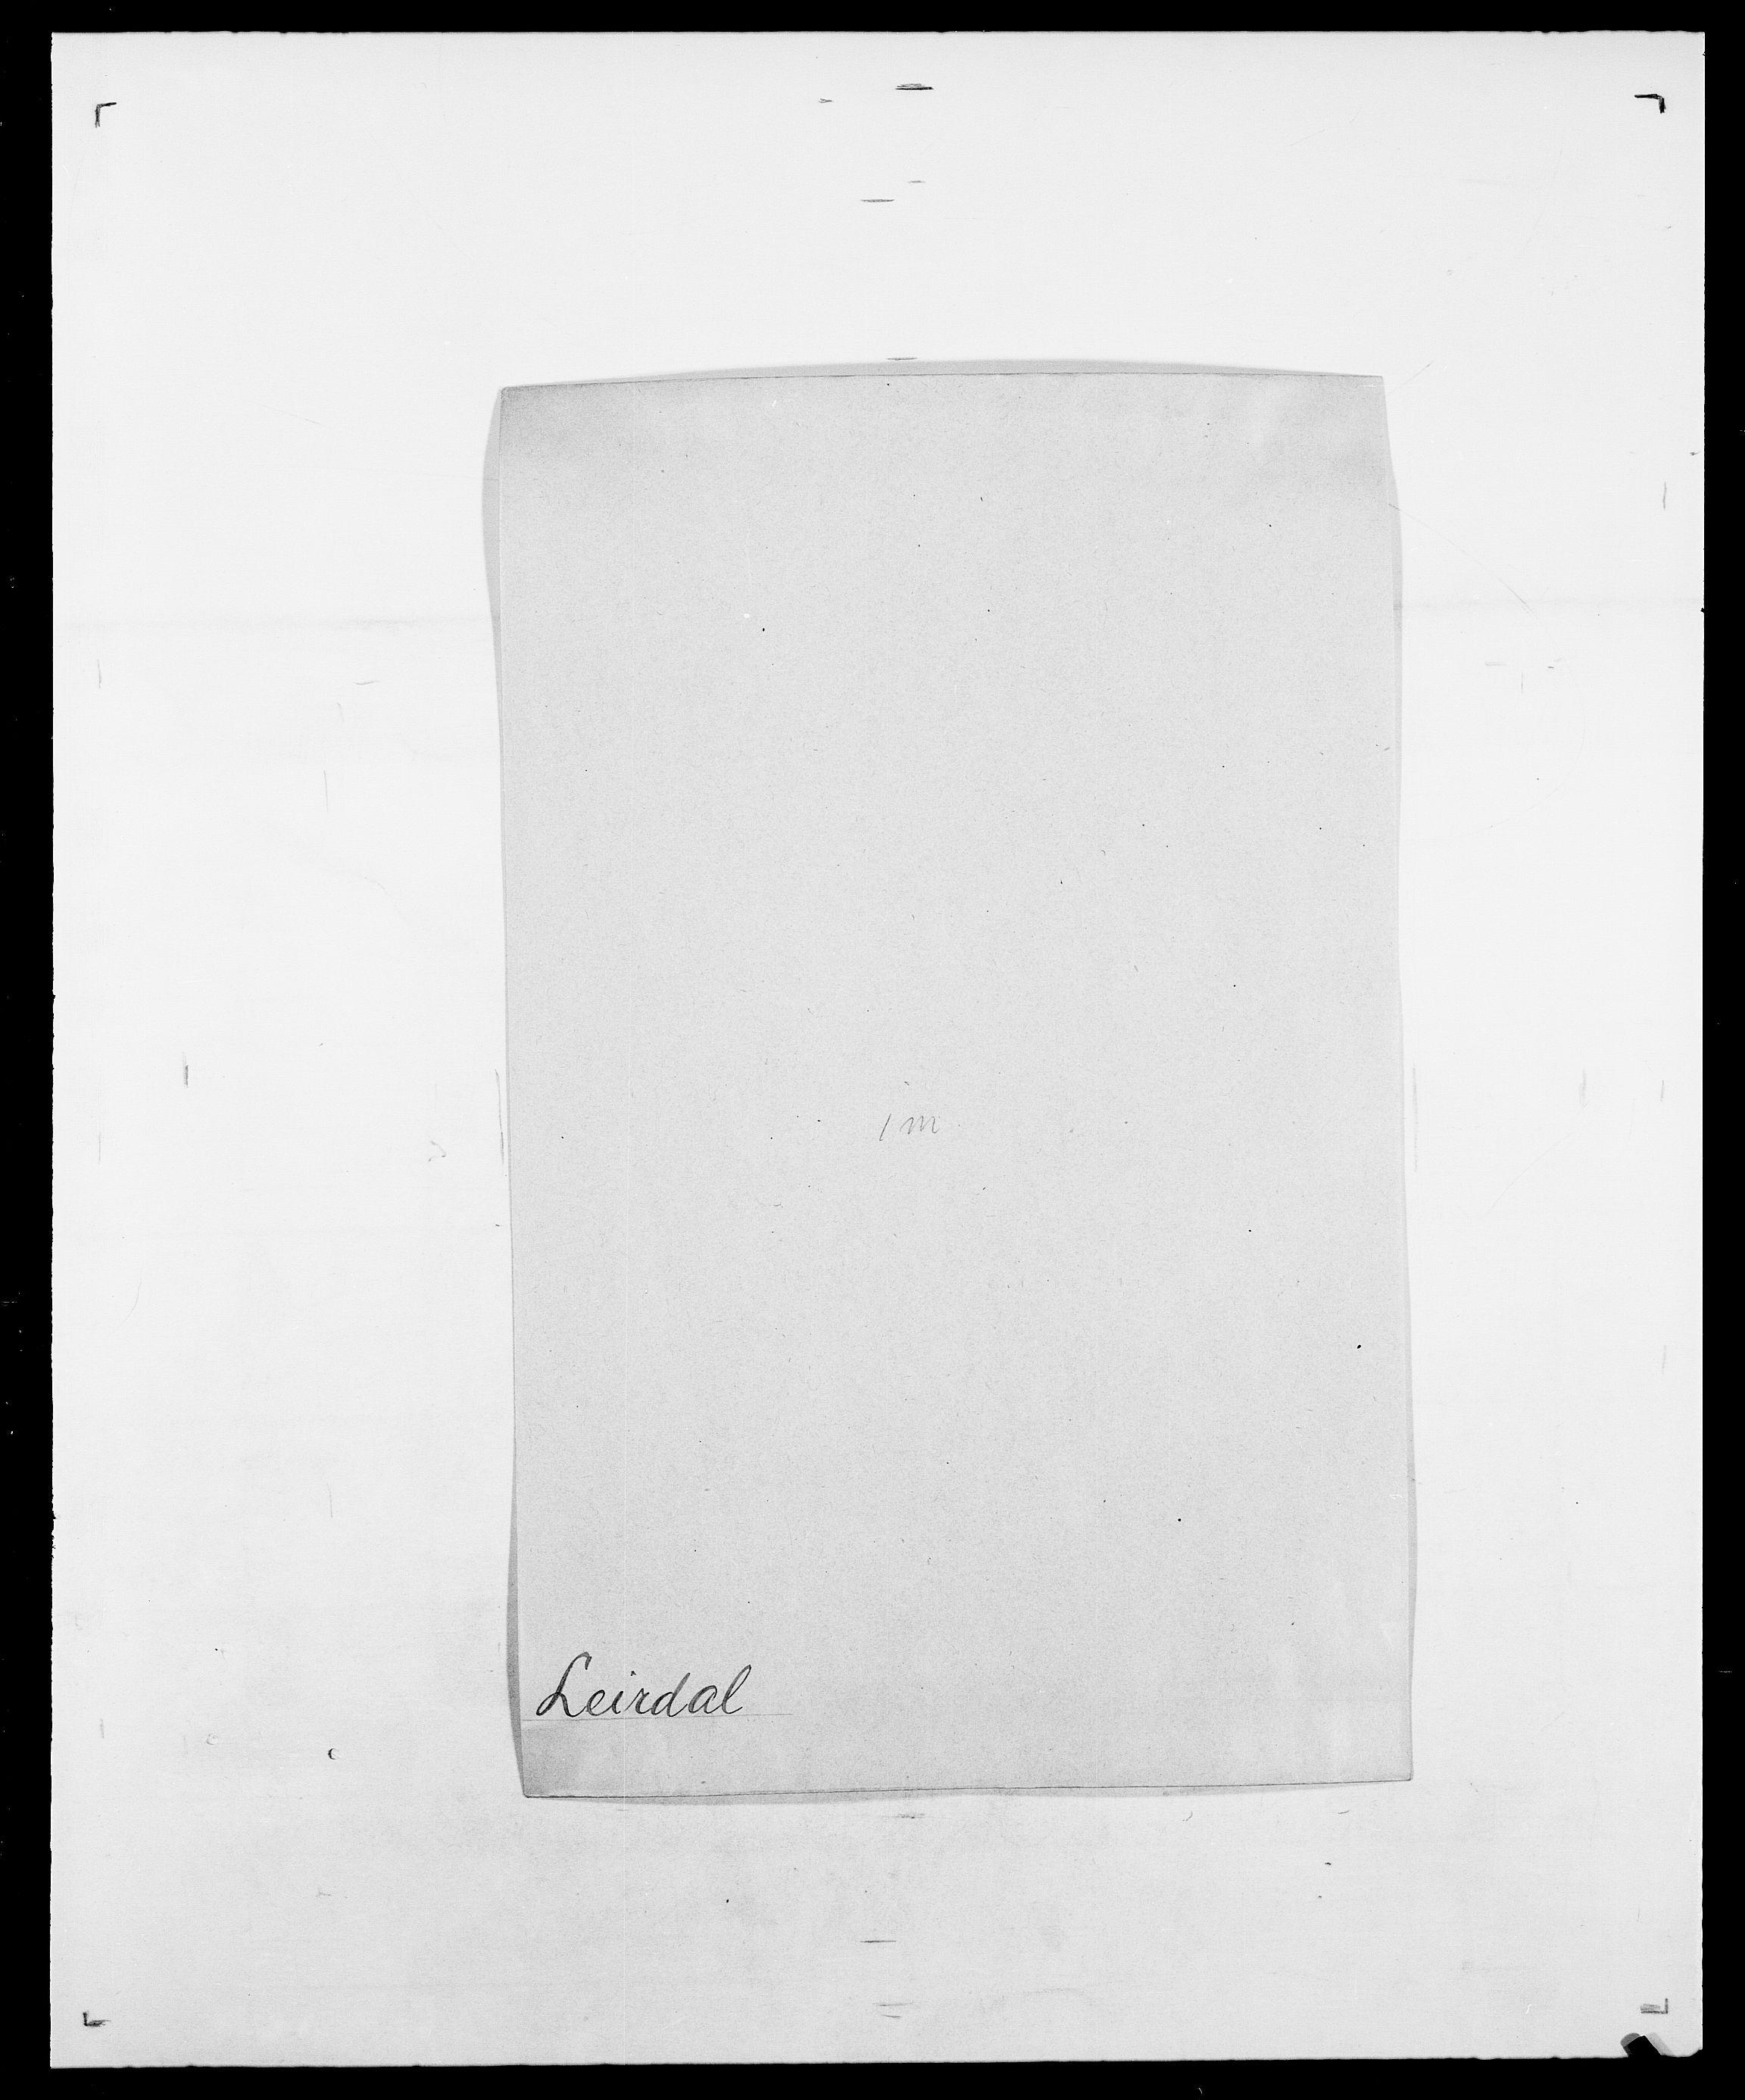 SAO, Delgobe, Charles Antoine - samling, D/Da/L0023: Lau - Lirvyn, s. 149